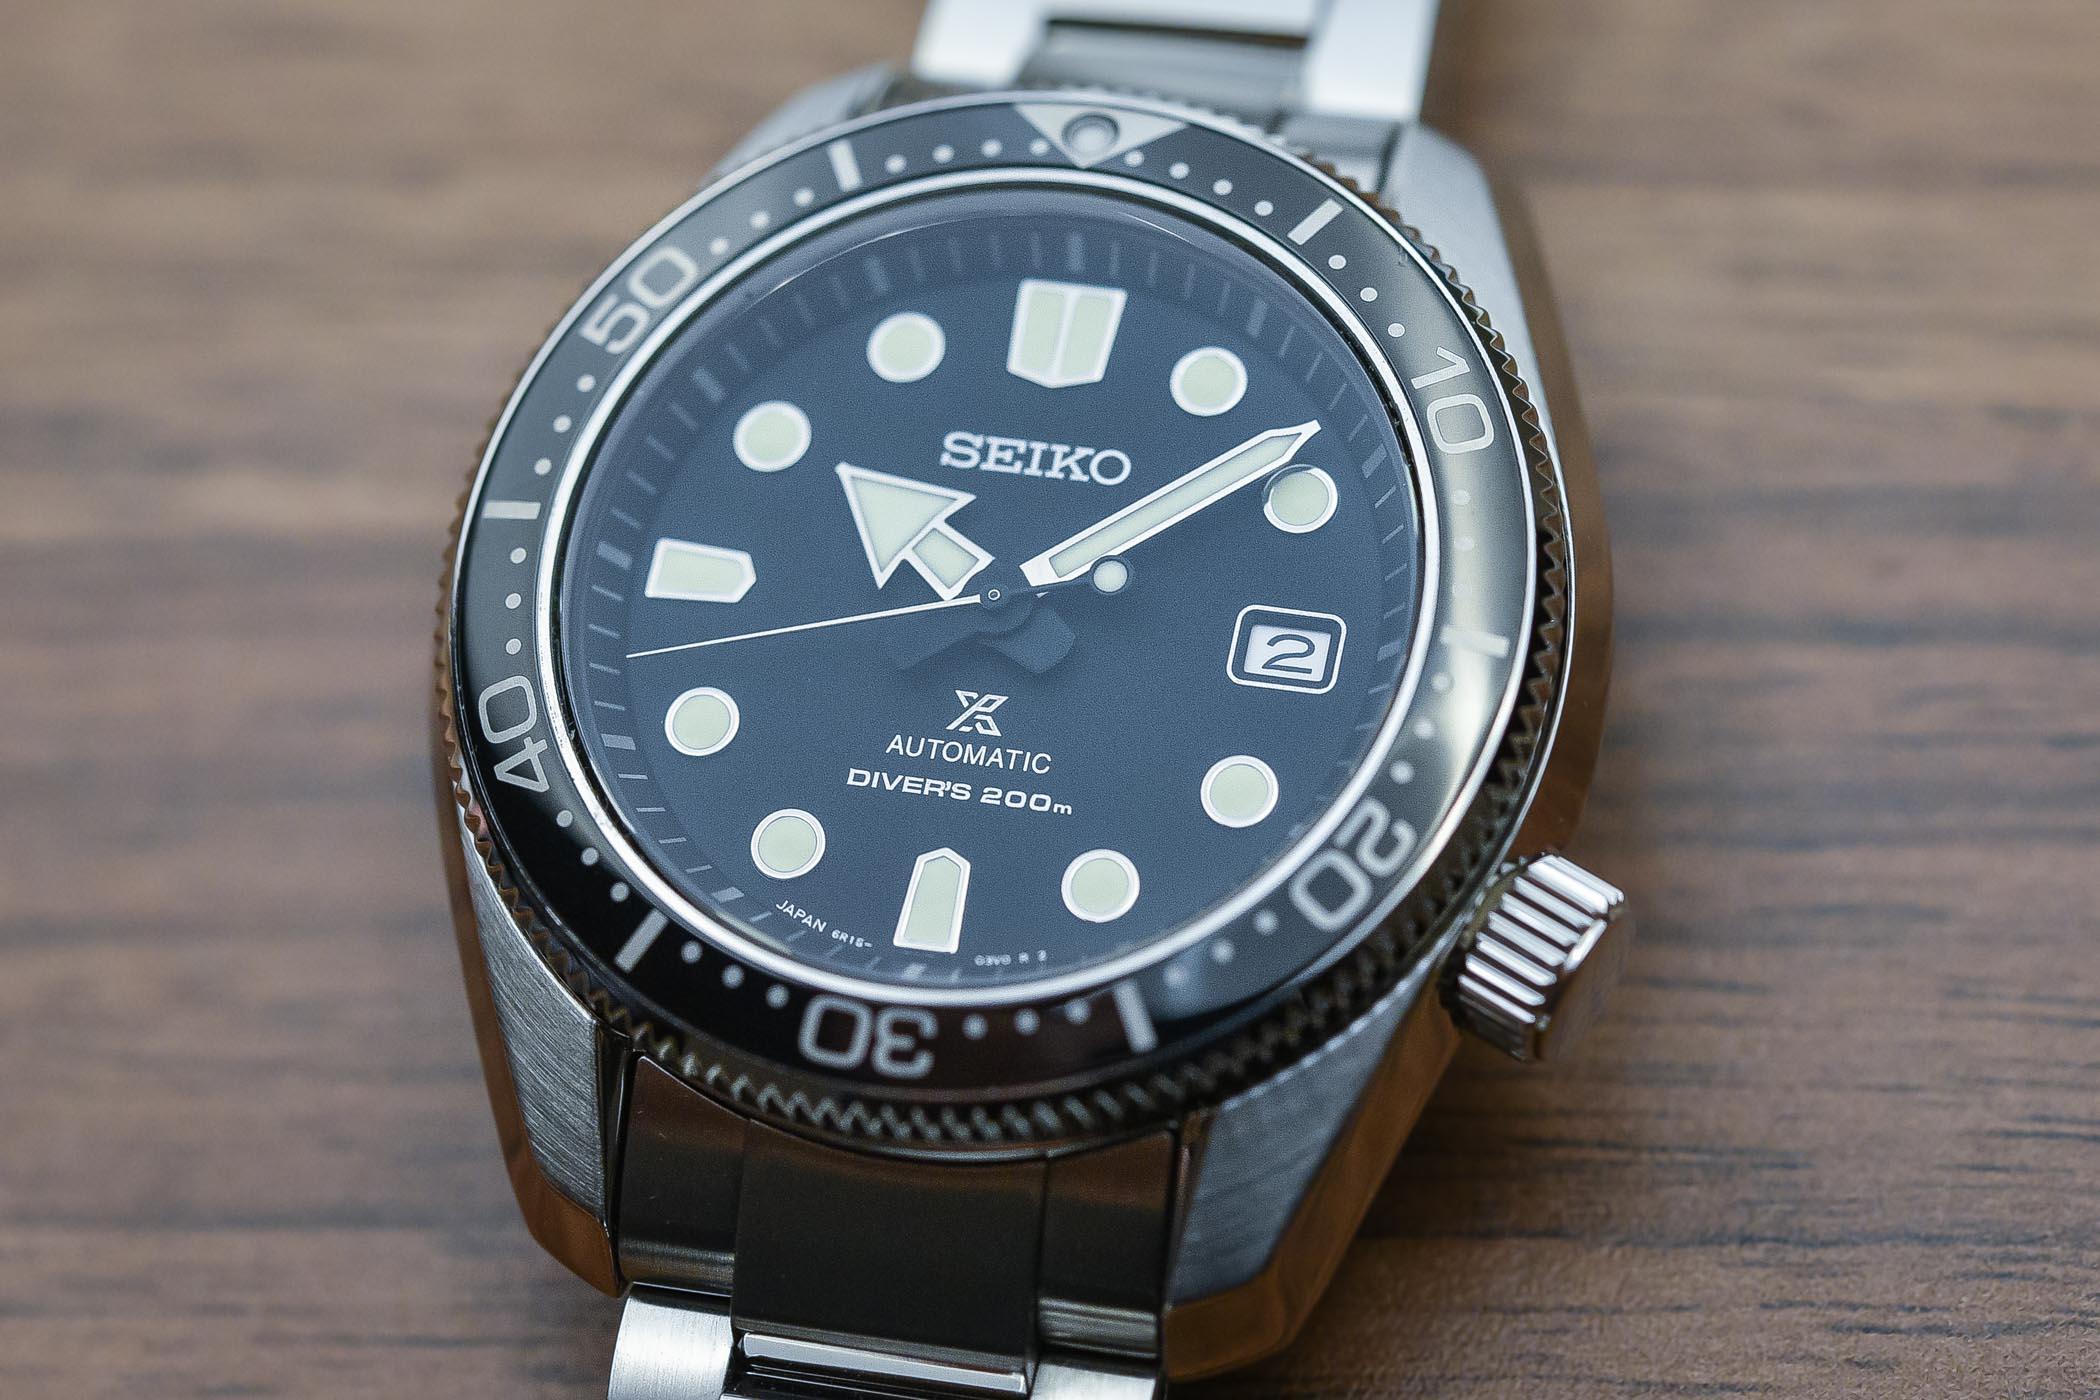 Seiko Prospex Diver 200m Spb077 Review Specs Amp Price